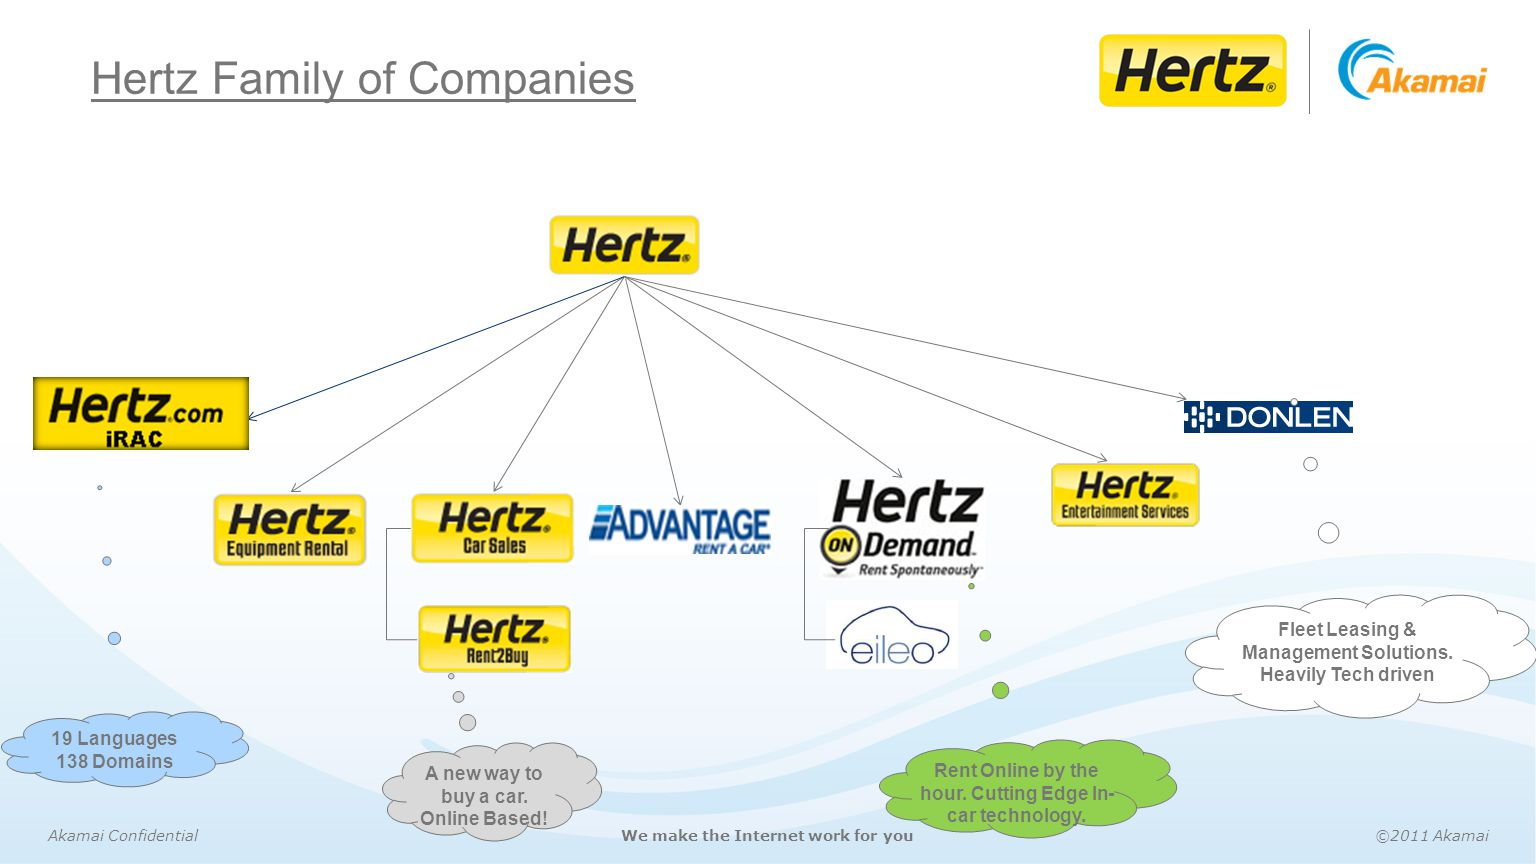 Hertz Family of Companies